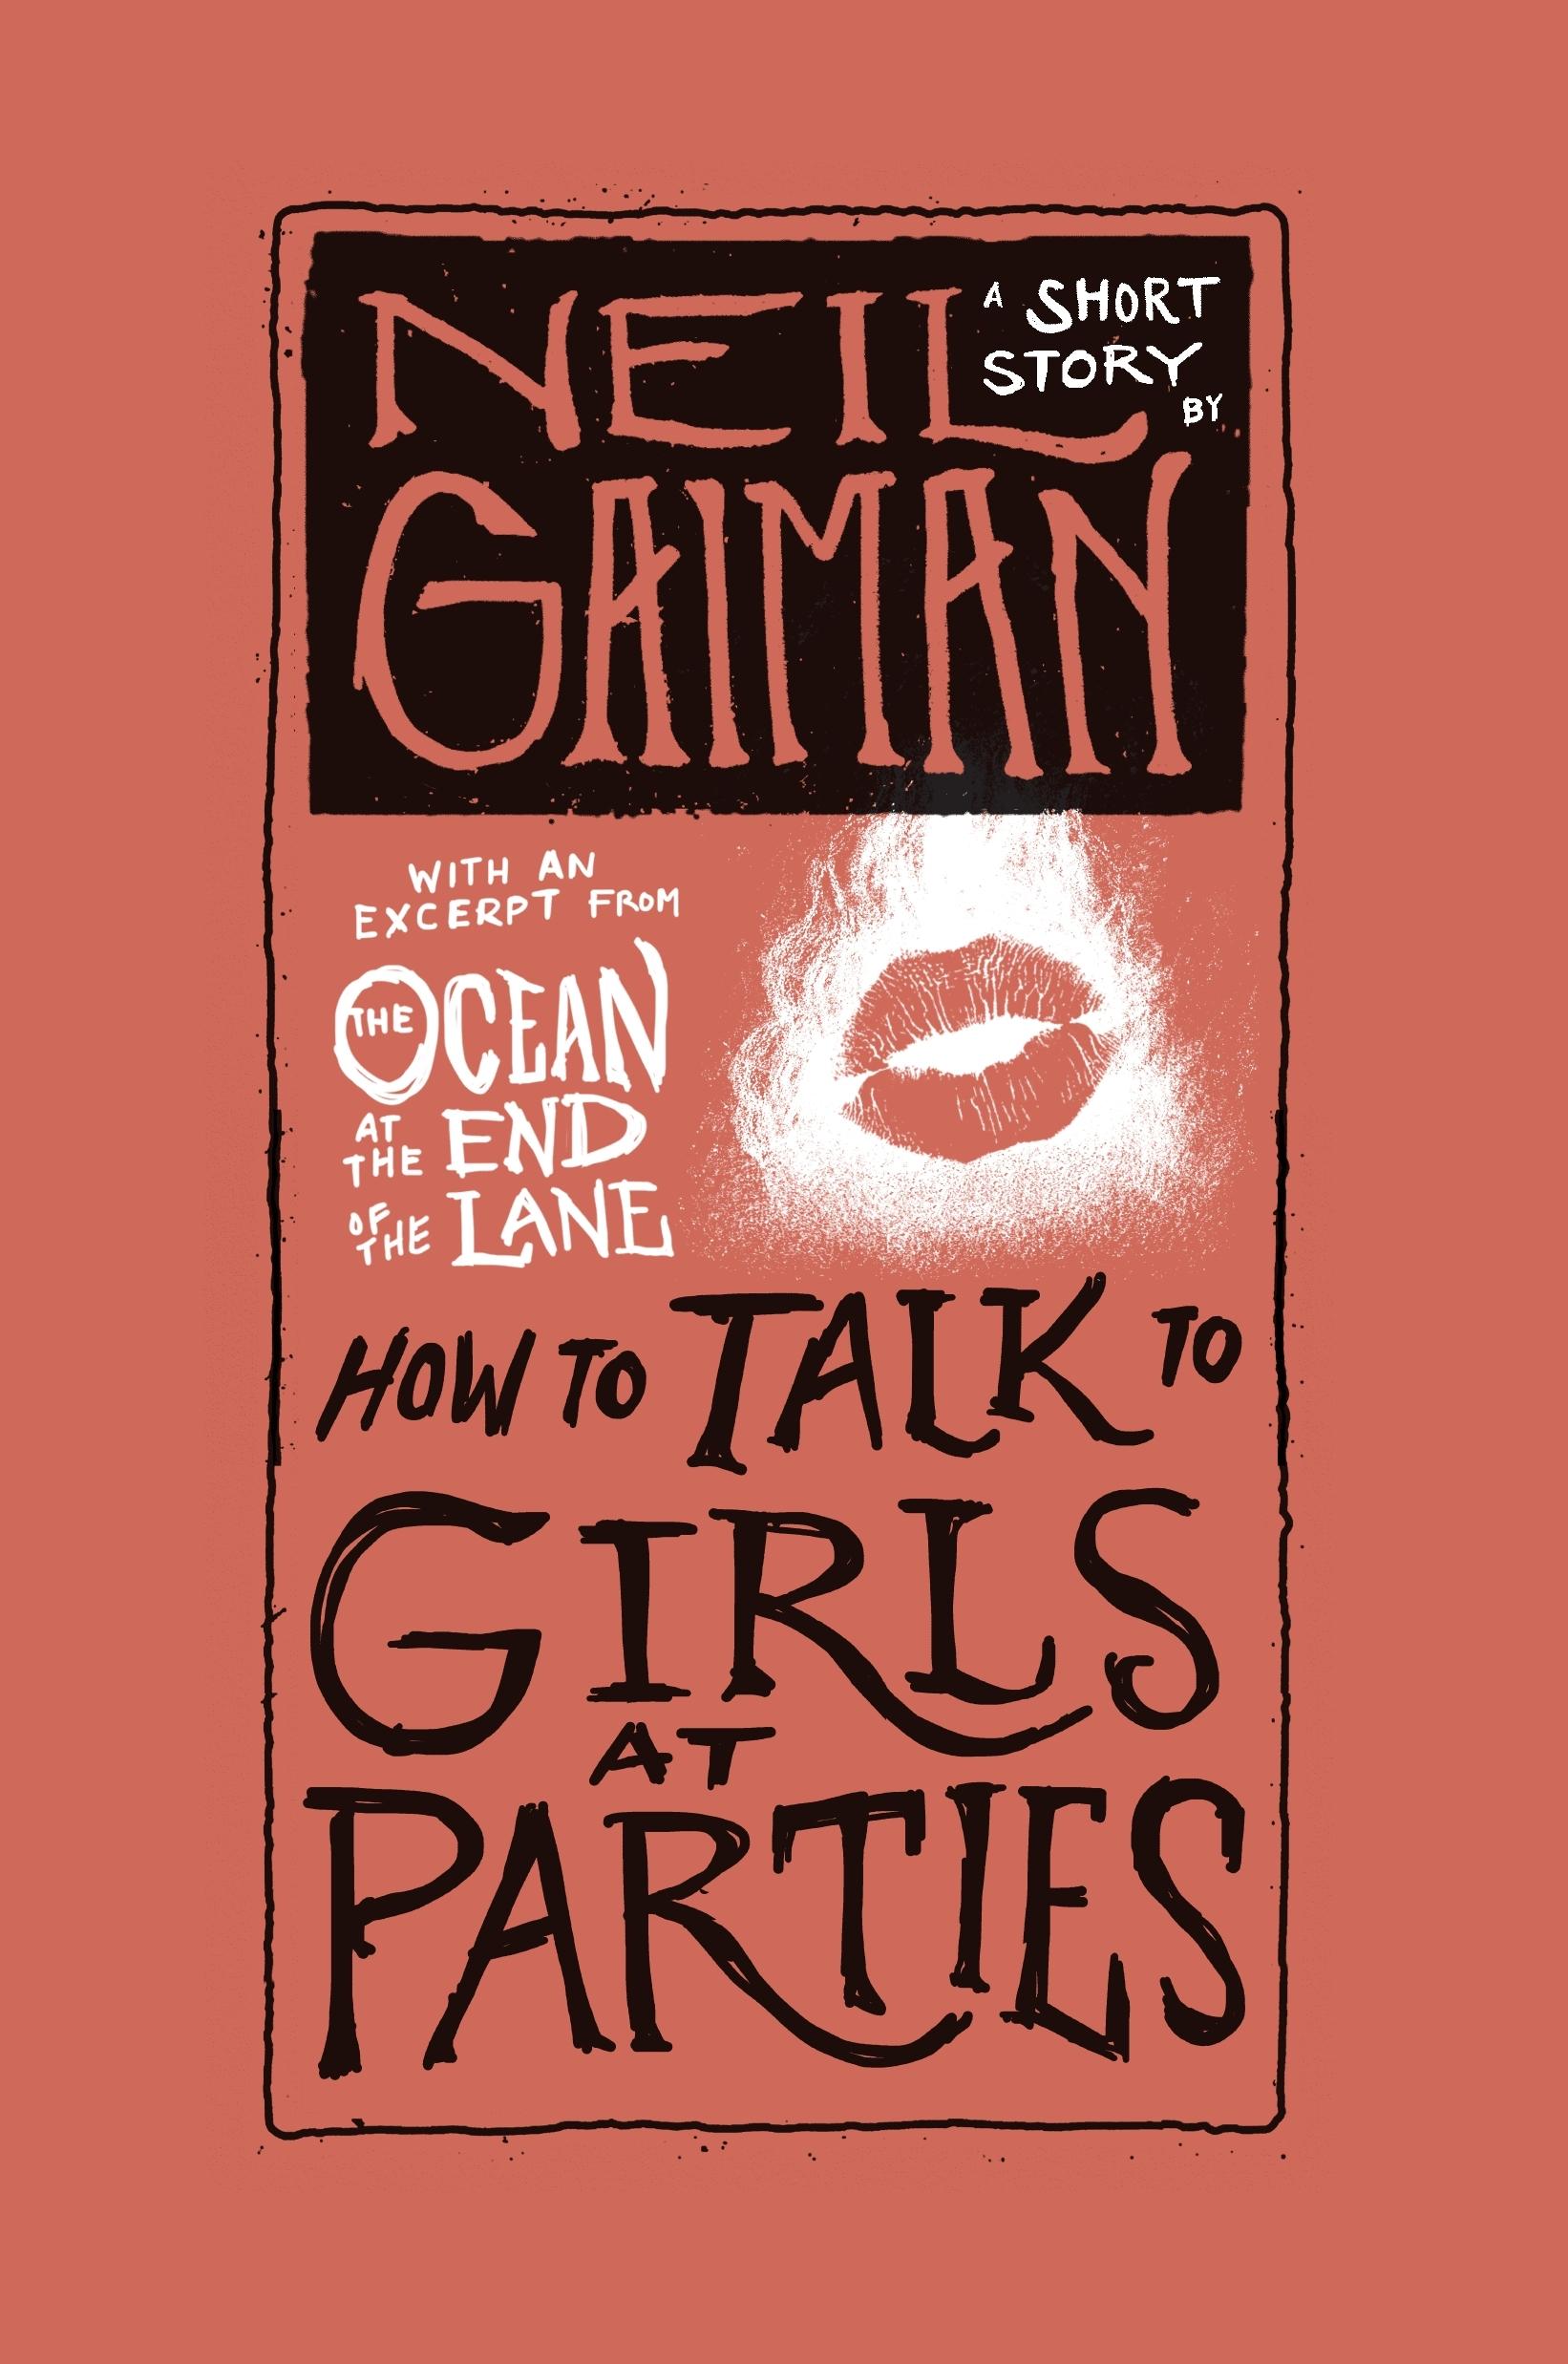 How To Talk To Girls '�graphic Howtottalktogirlsatparties